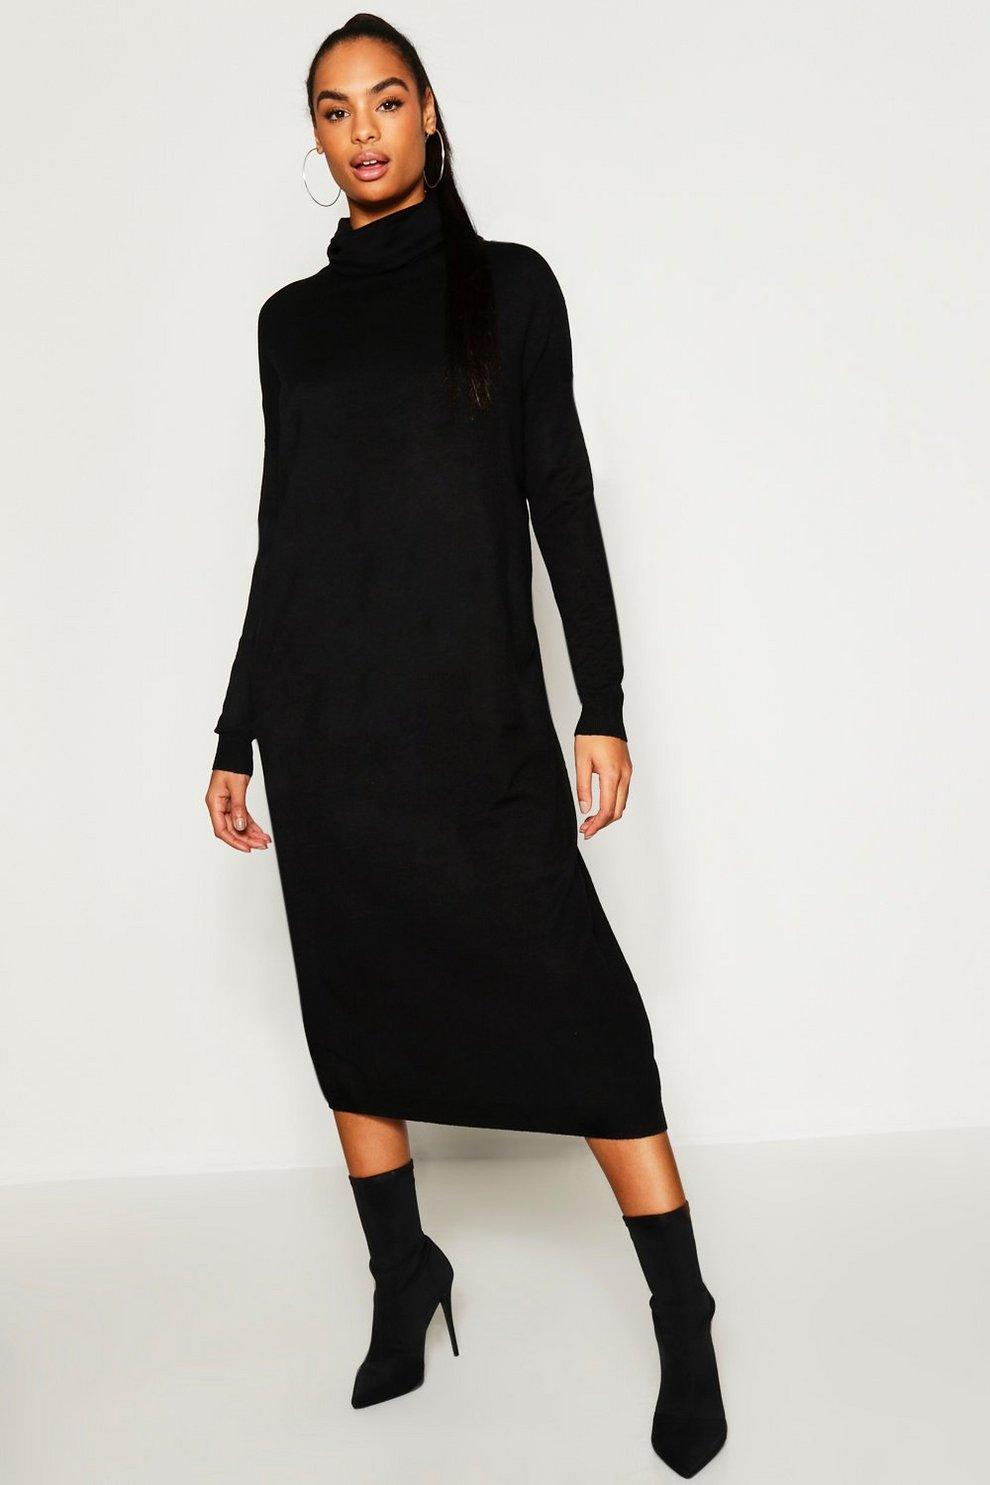 dfb16136cb83 Womens Black Tall Roll Neck Knitted Dress